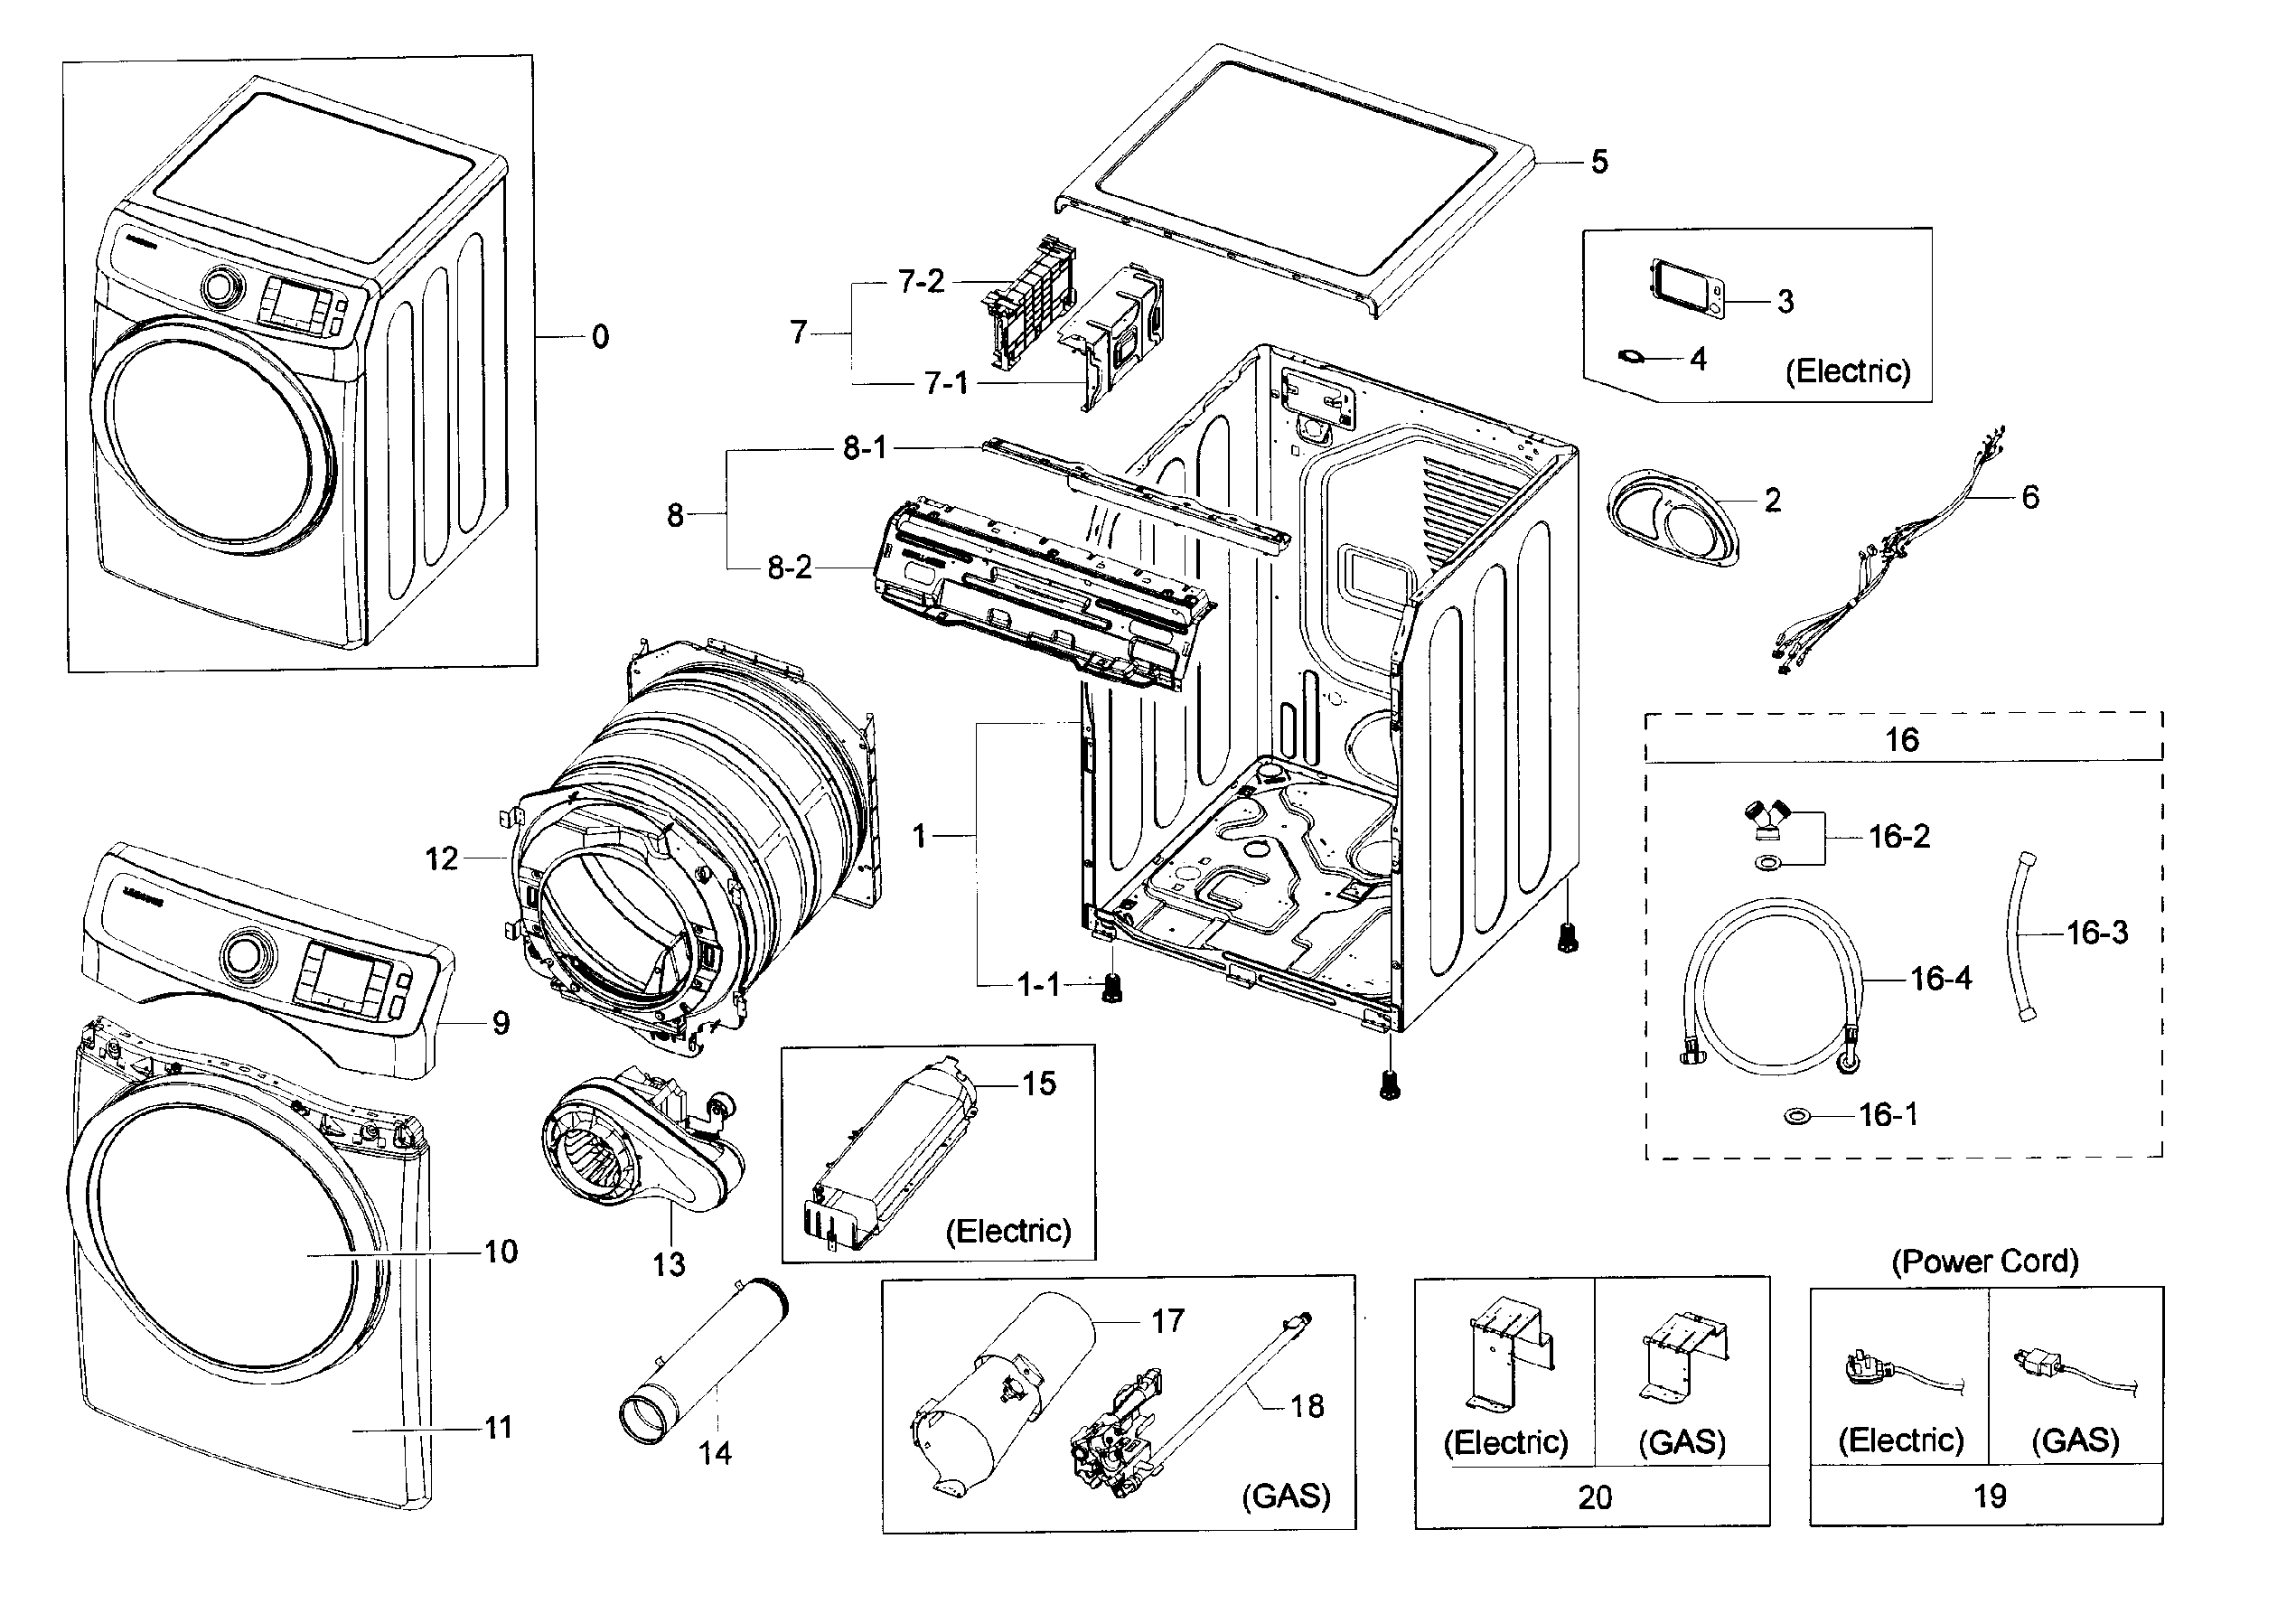 Samsung Dv520aep Xaa Dryer Wiring Diagram 1949 F100 Engine Diagram Tos30 Yenpancane Jeanjaures37 Fr